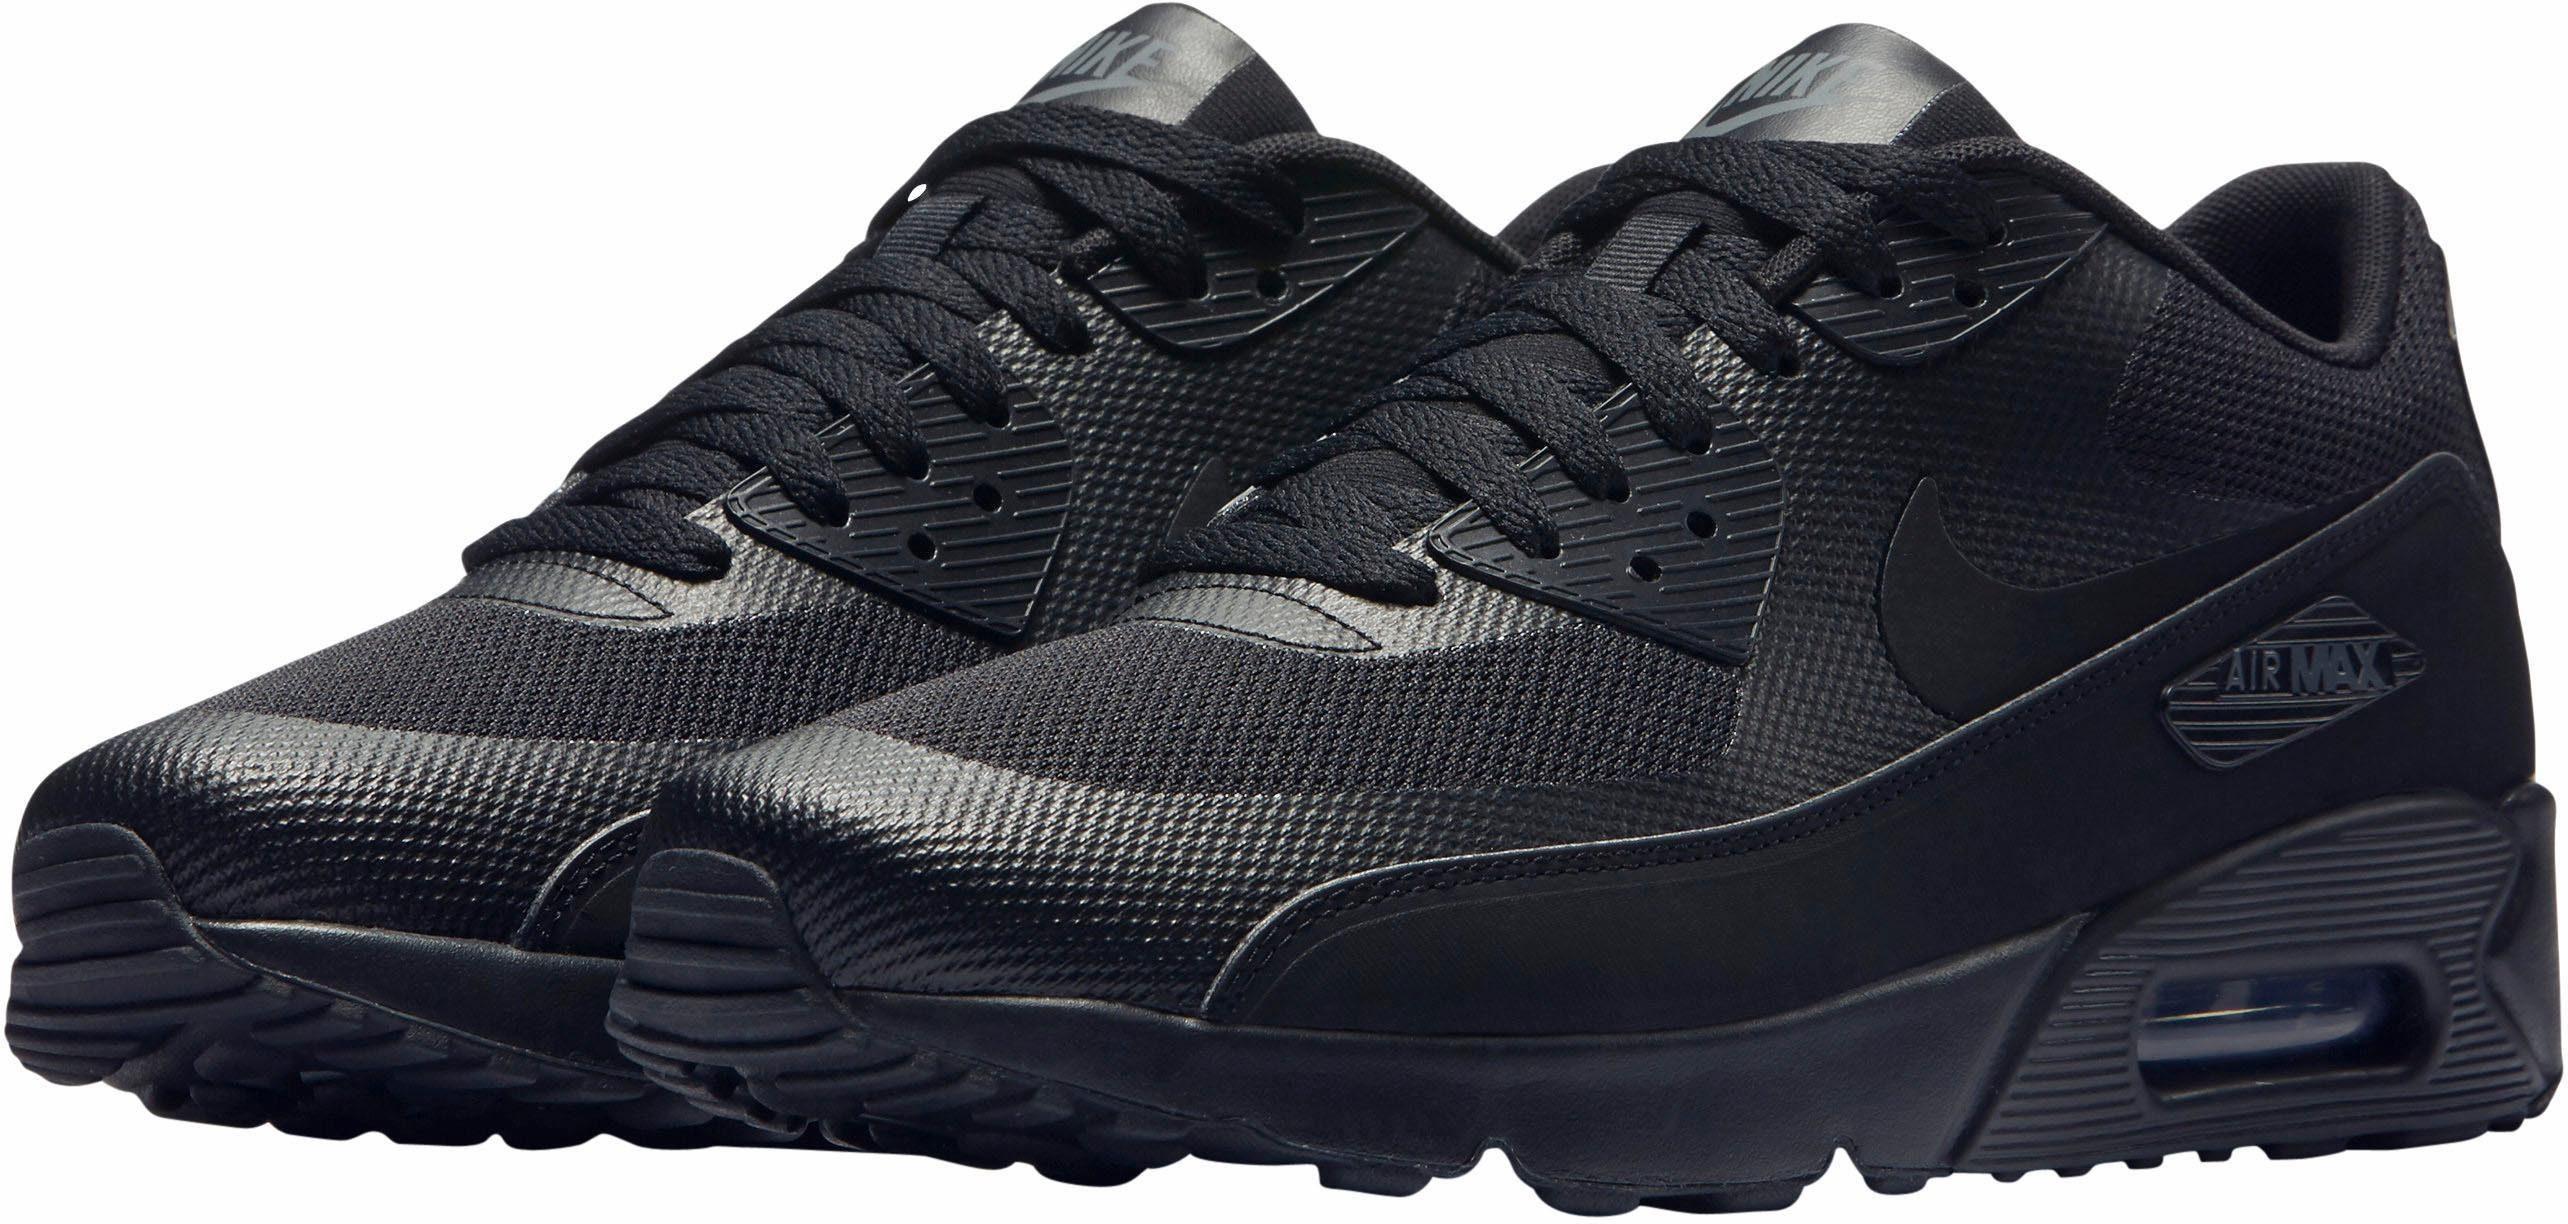 Nike Sportswear »AIR MAX 90 ULTRA 2.0 ESSENTIAL« Sneaker online kaufen | OTTO